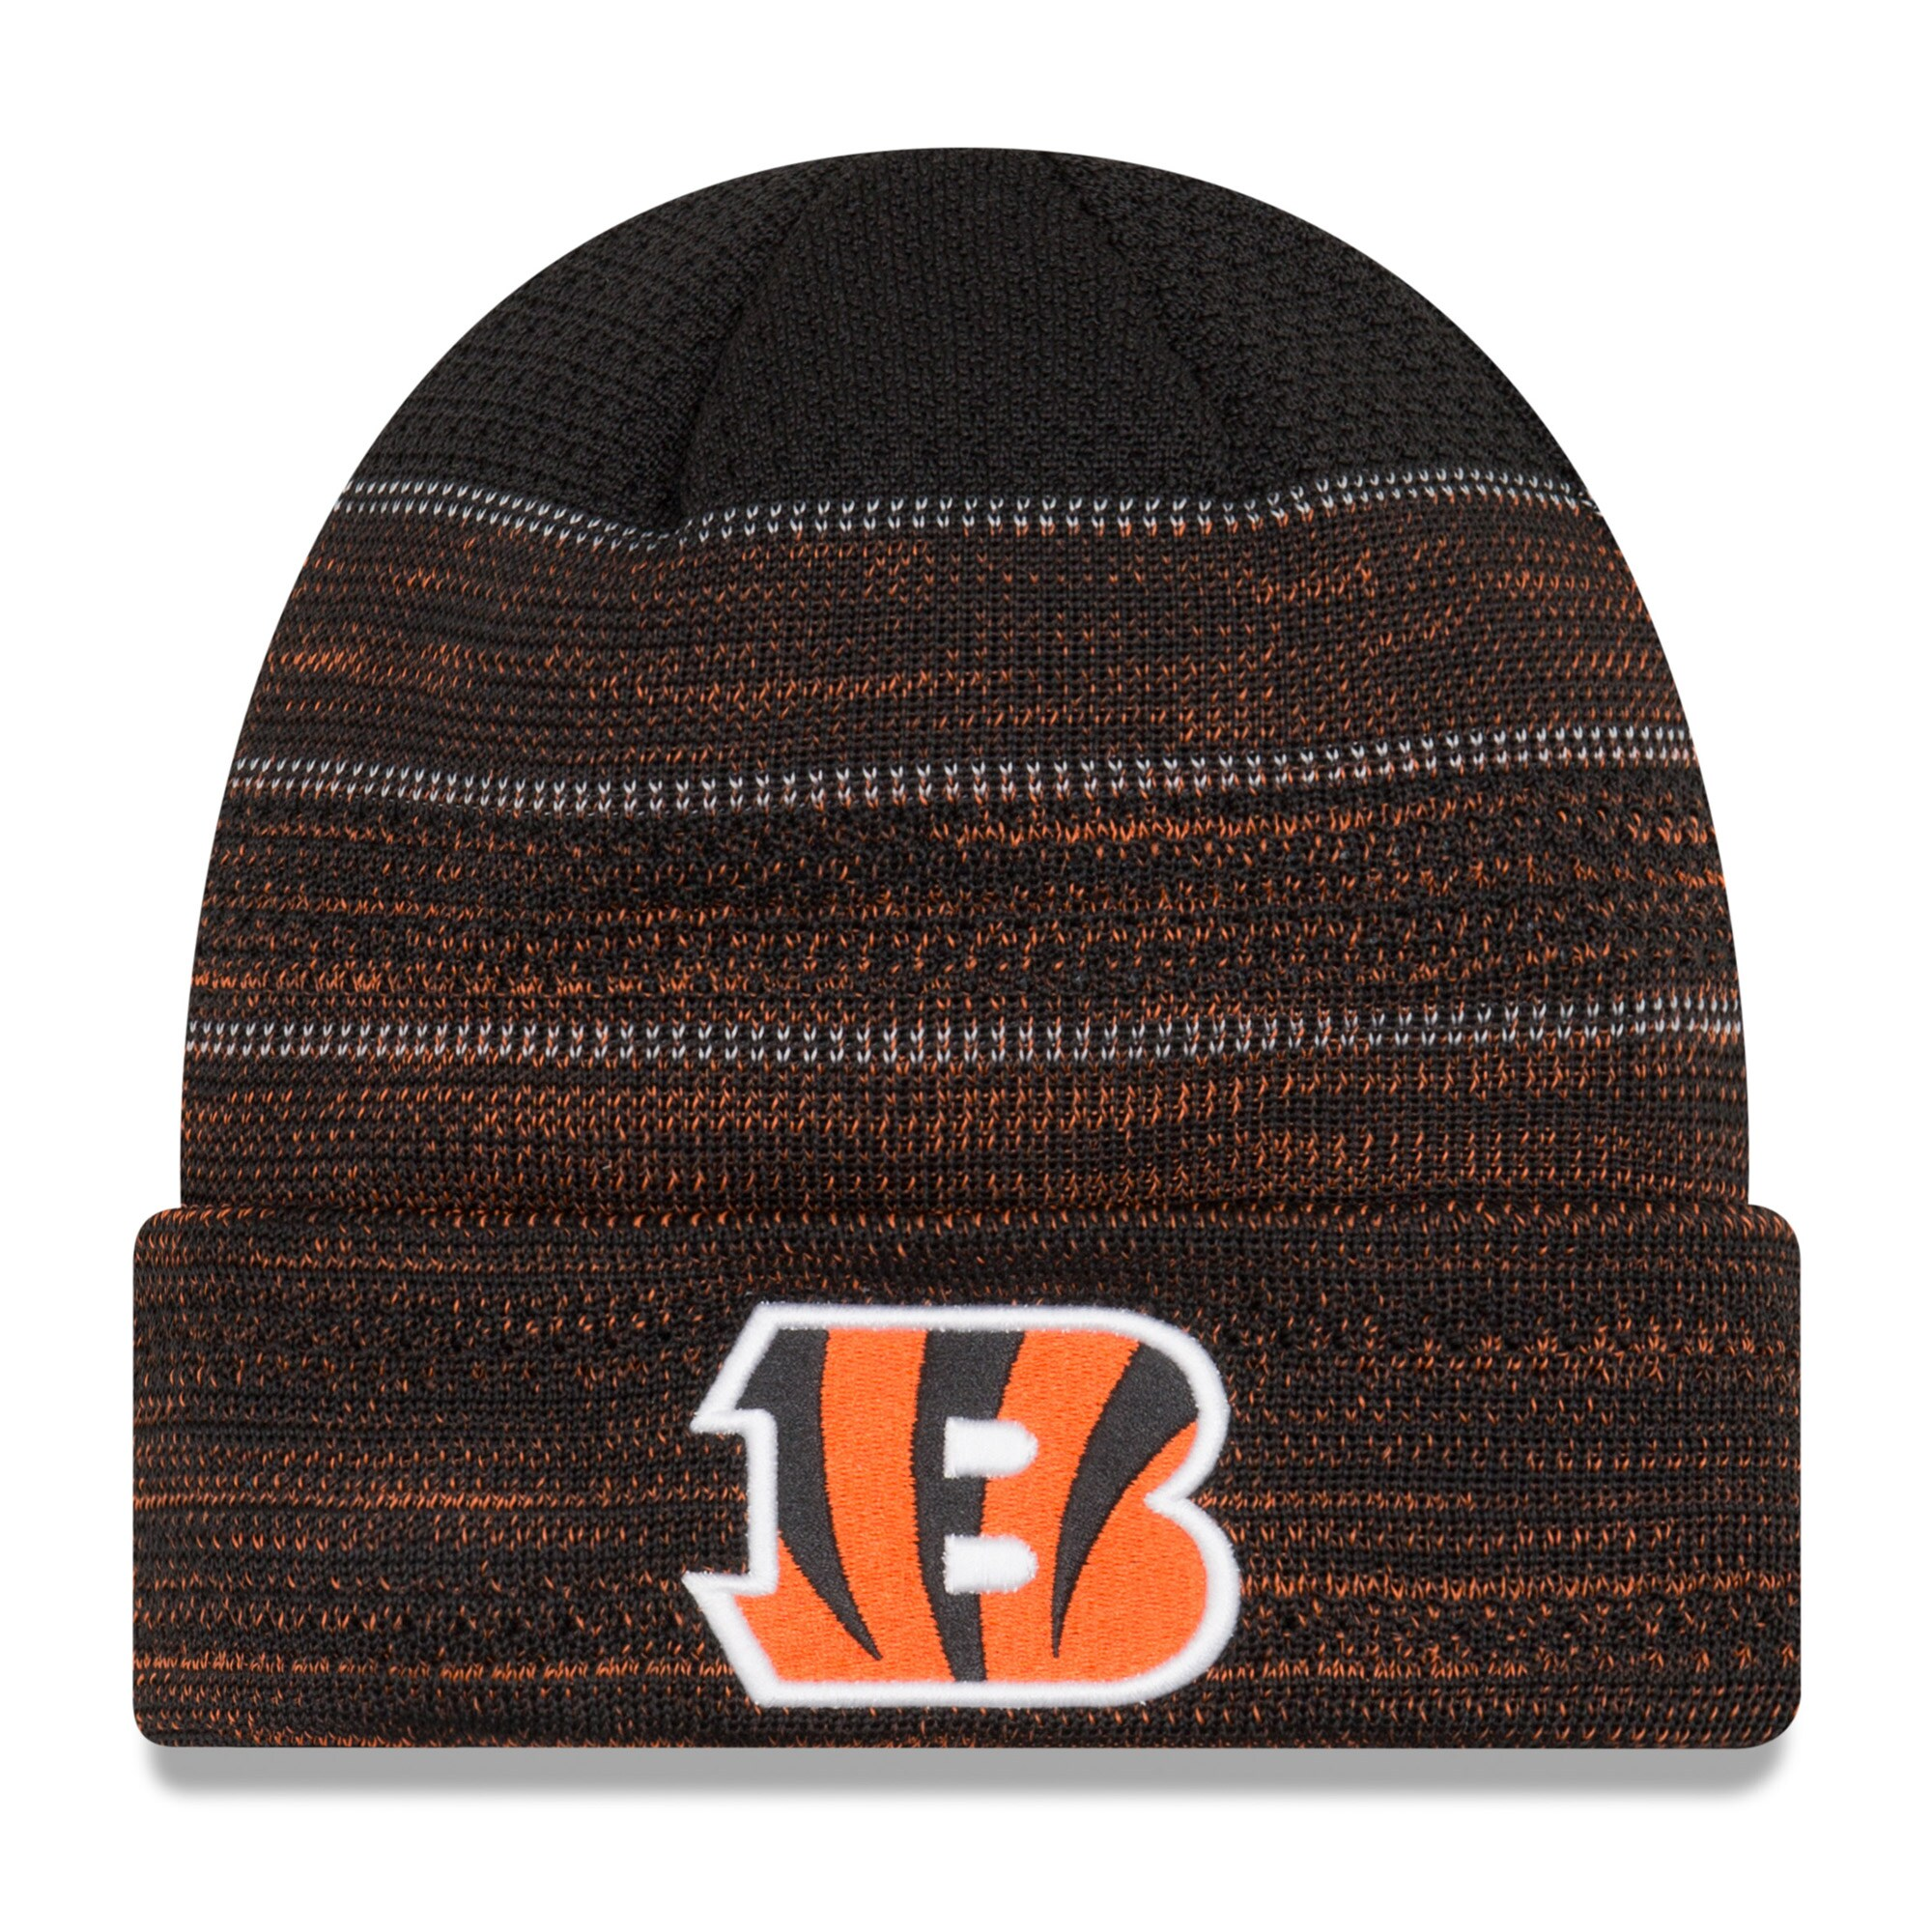 Cincinnati Bengals New Era Youth 2017 Sideline Official TD Knit Hat - Black